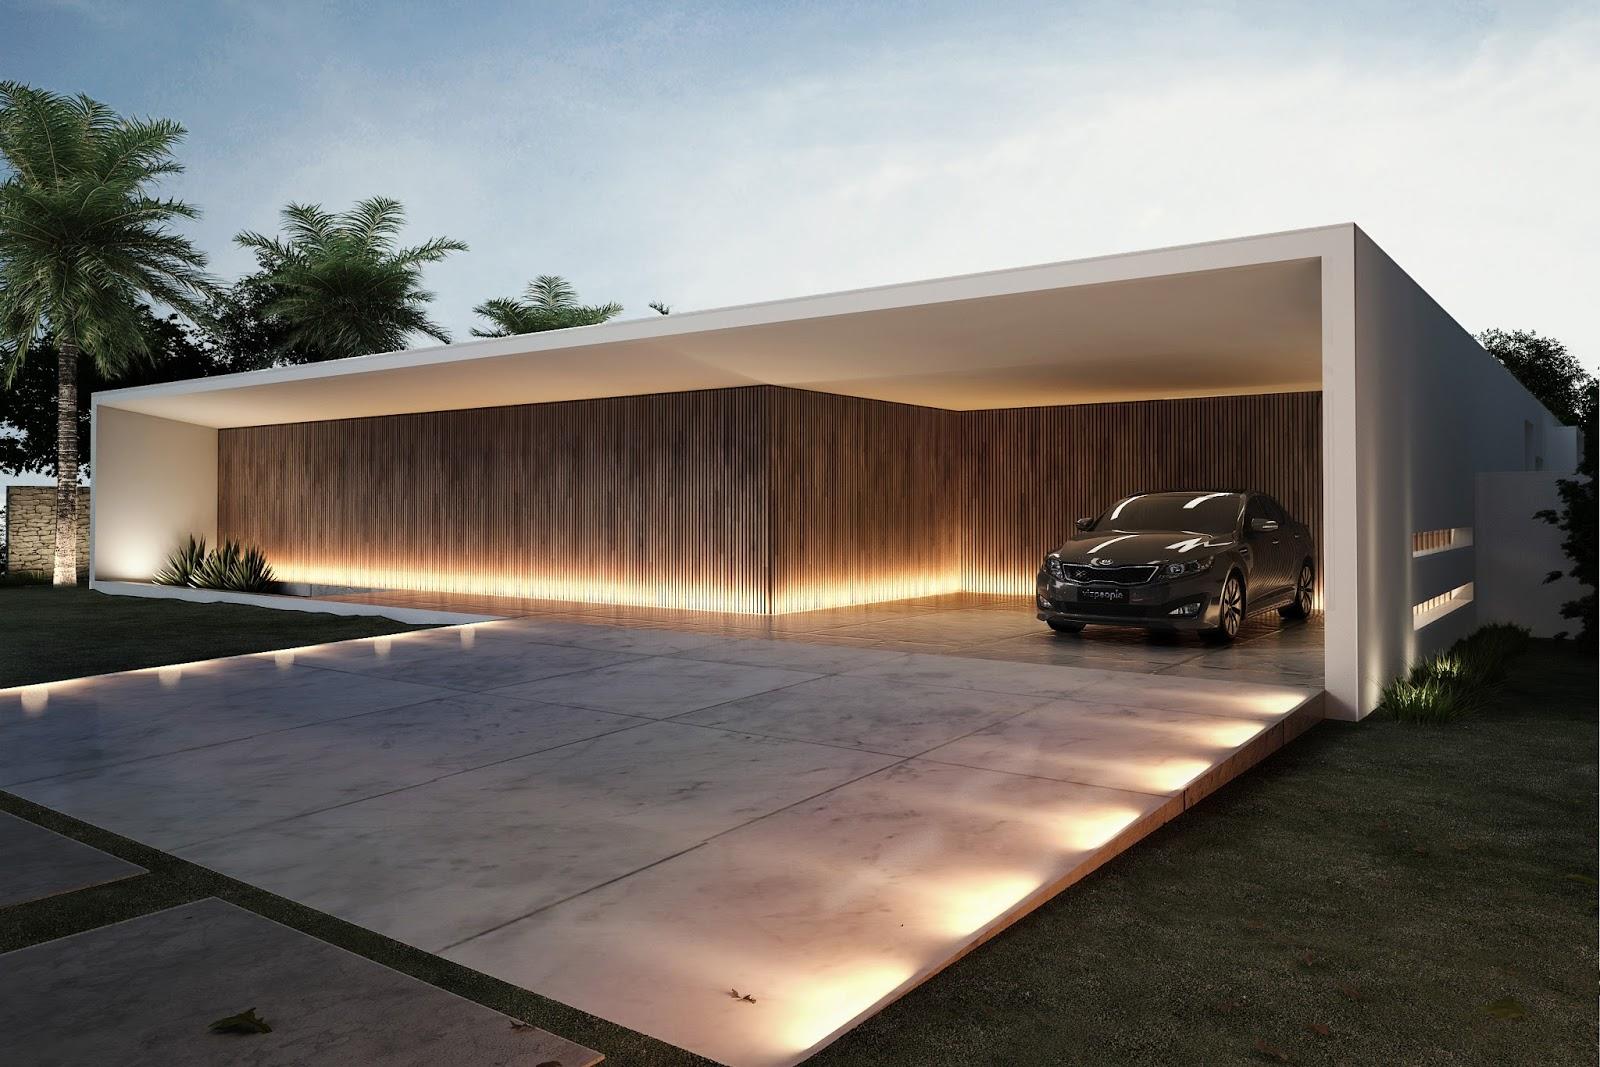 Casa fachada branca minimalista moderna decor salteado 15 for Casa minimalista veracruz